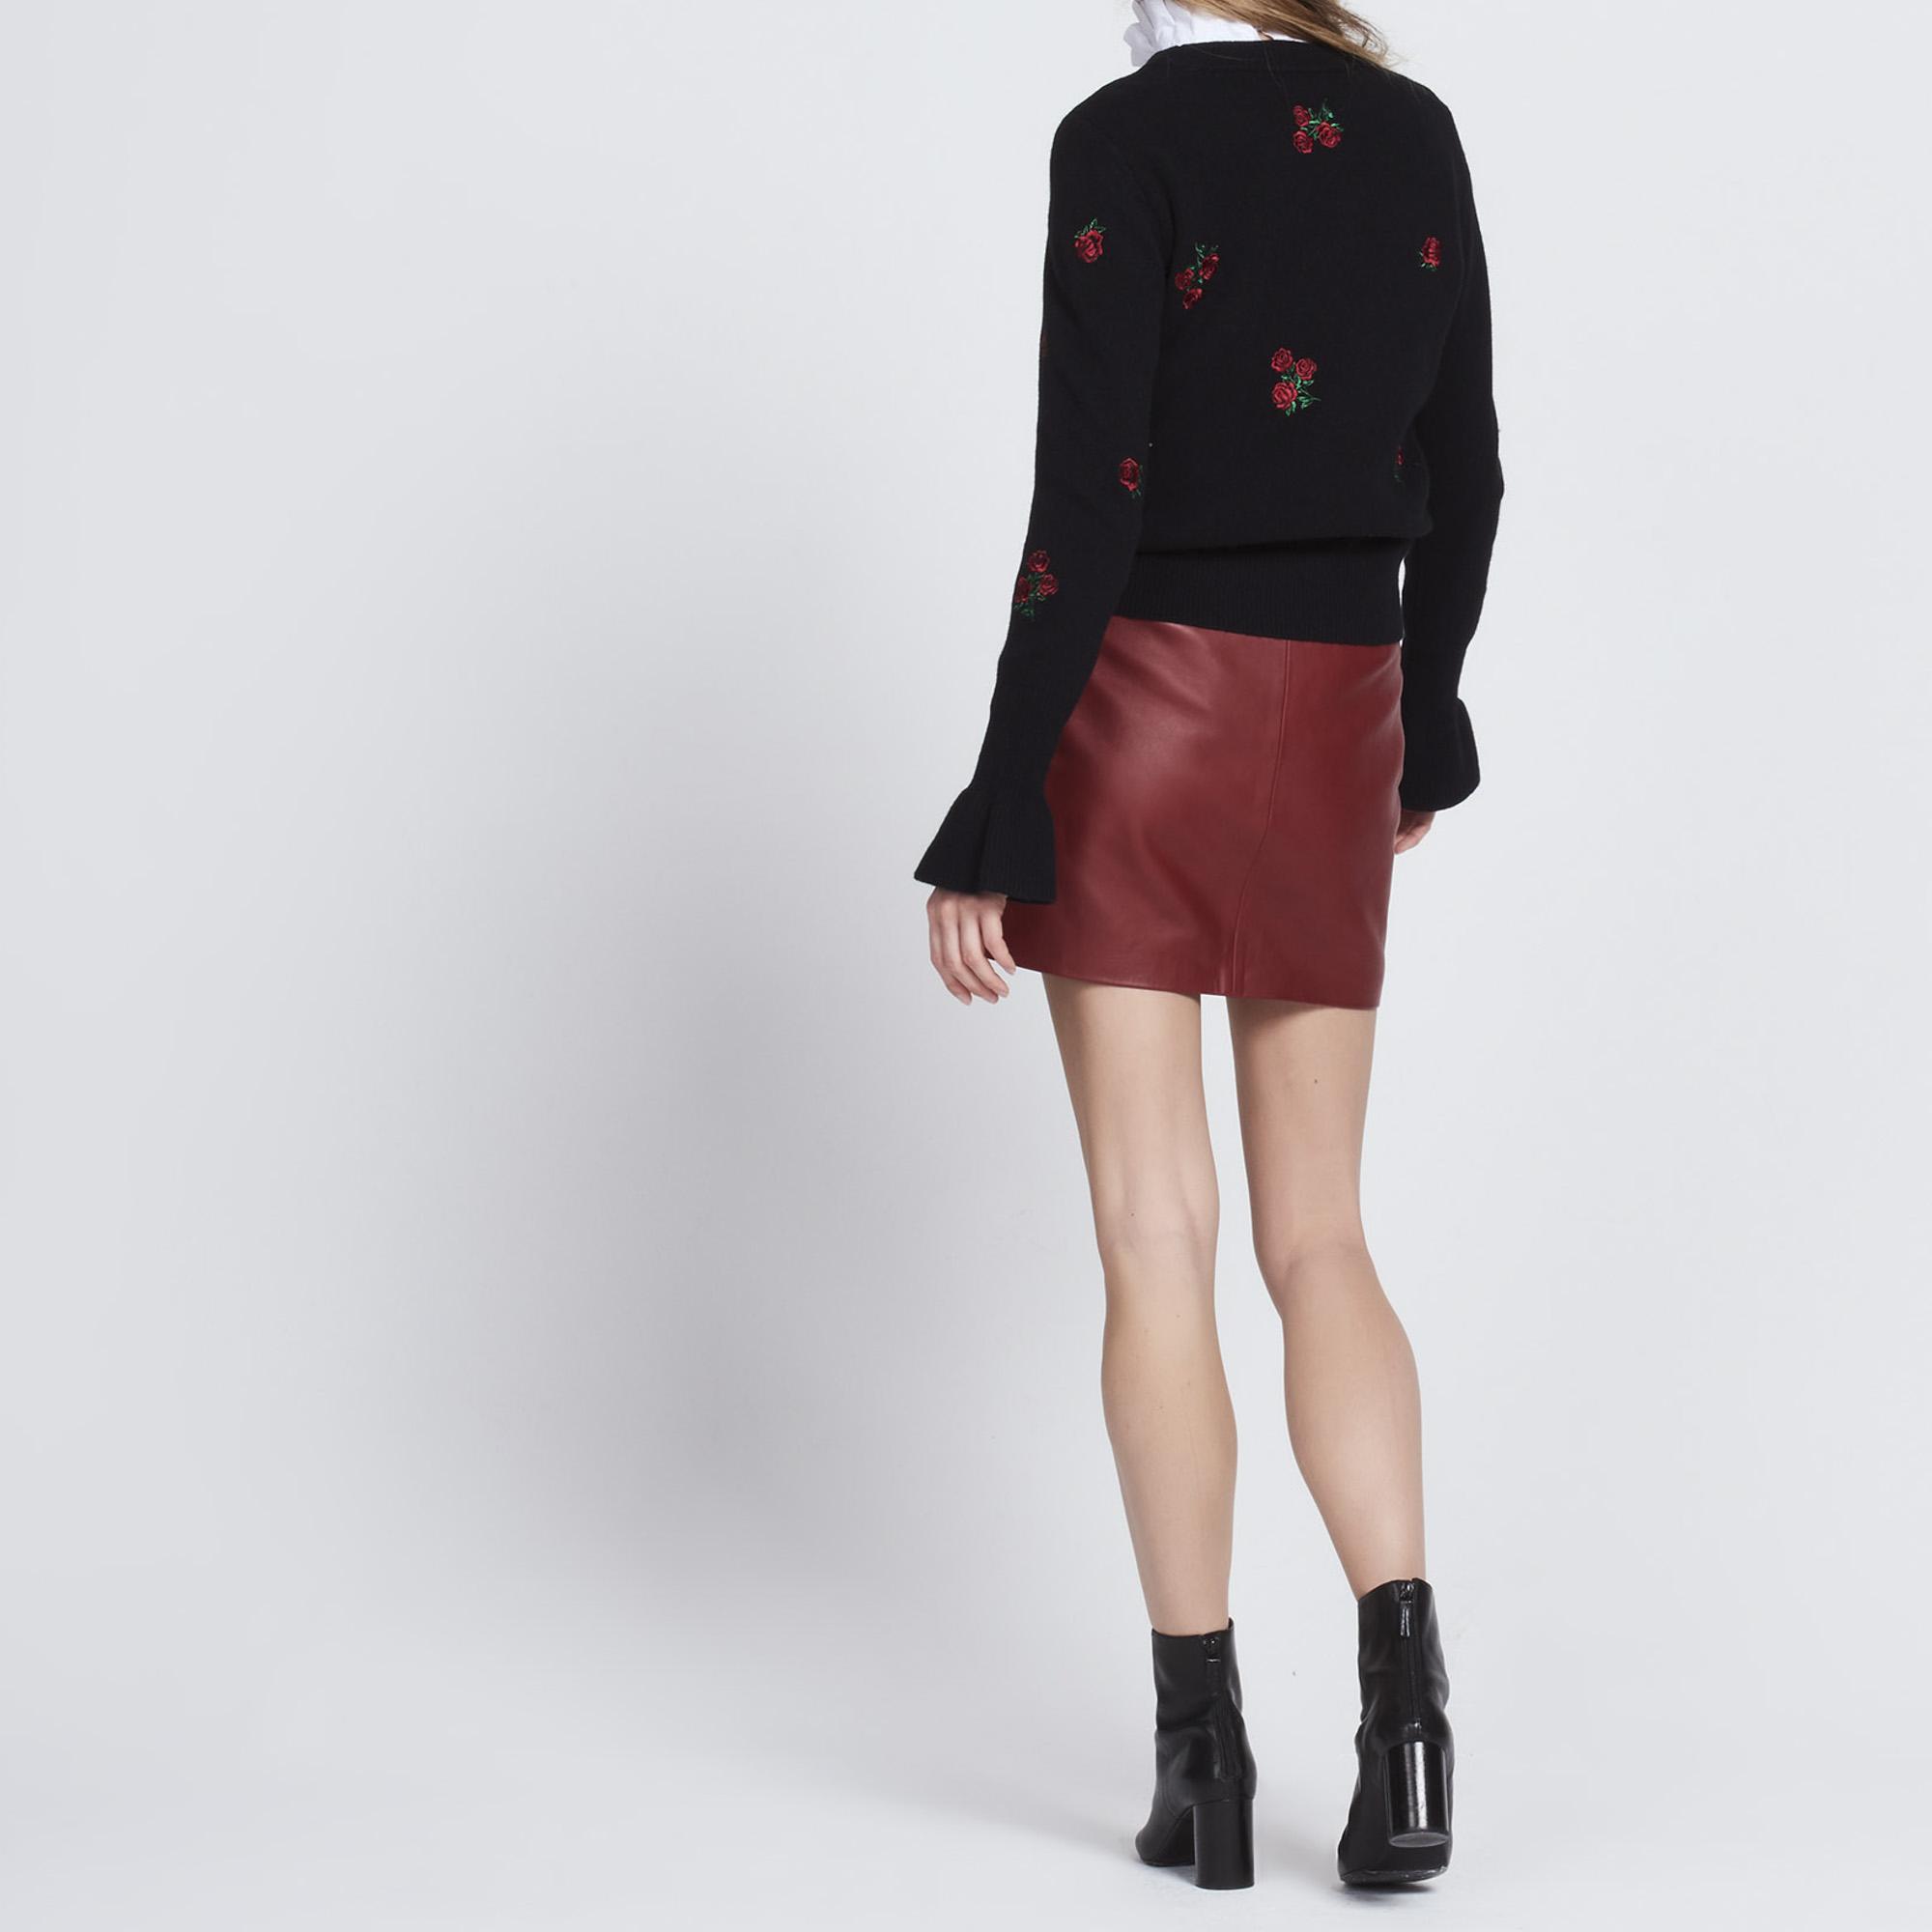 Pullover in lana con rose ricamate : La Sélection Last Chance colore